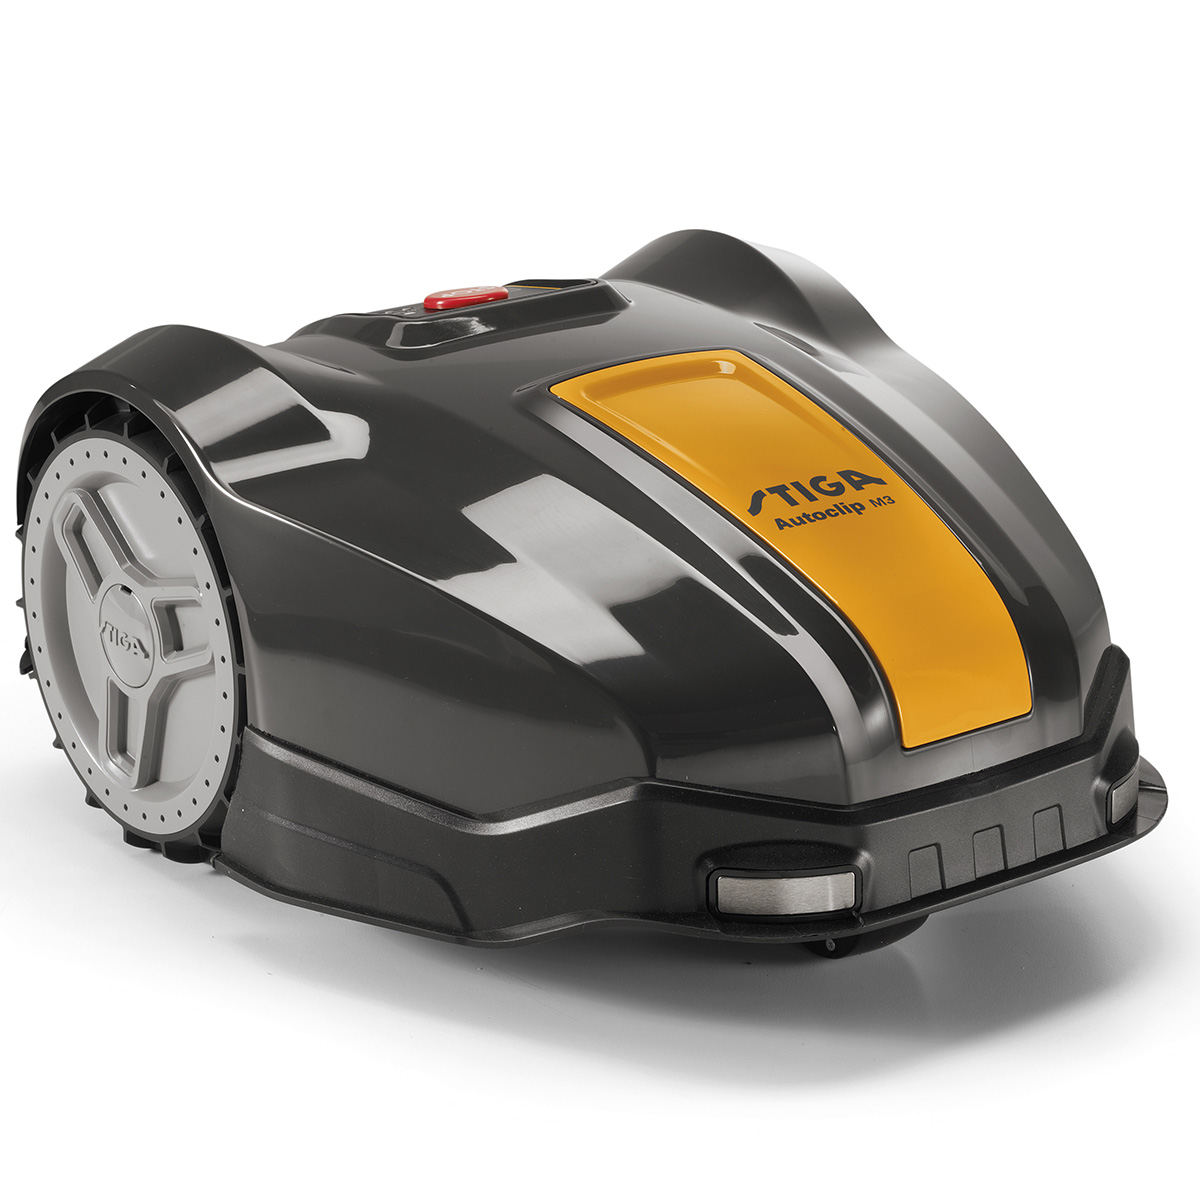 Stiga robotplæneklipper - Autoclip M3